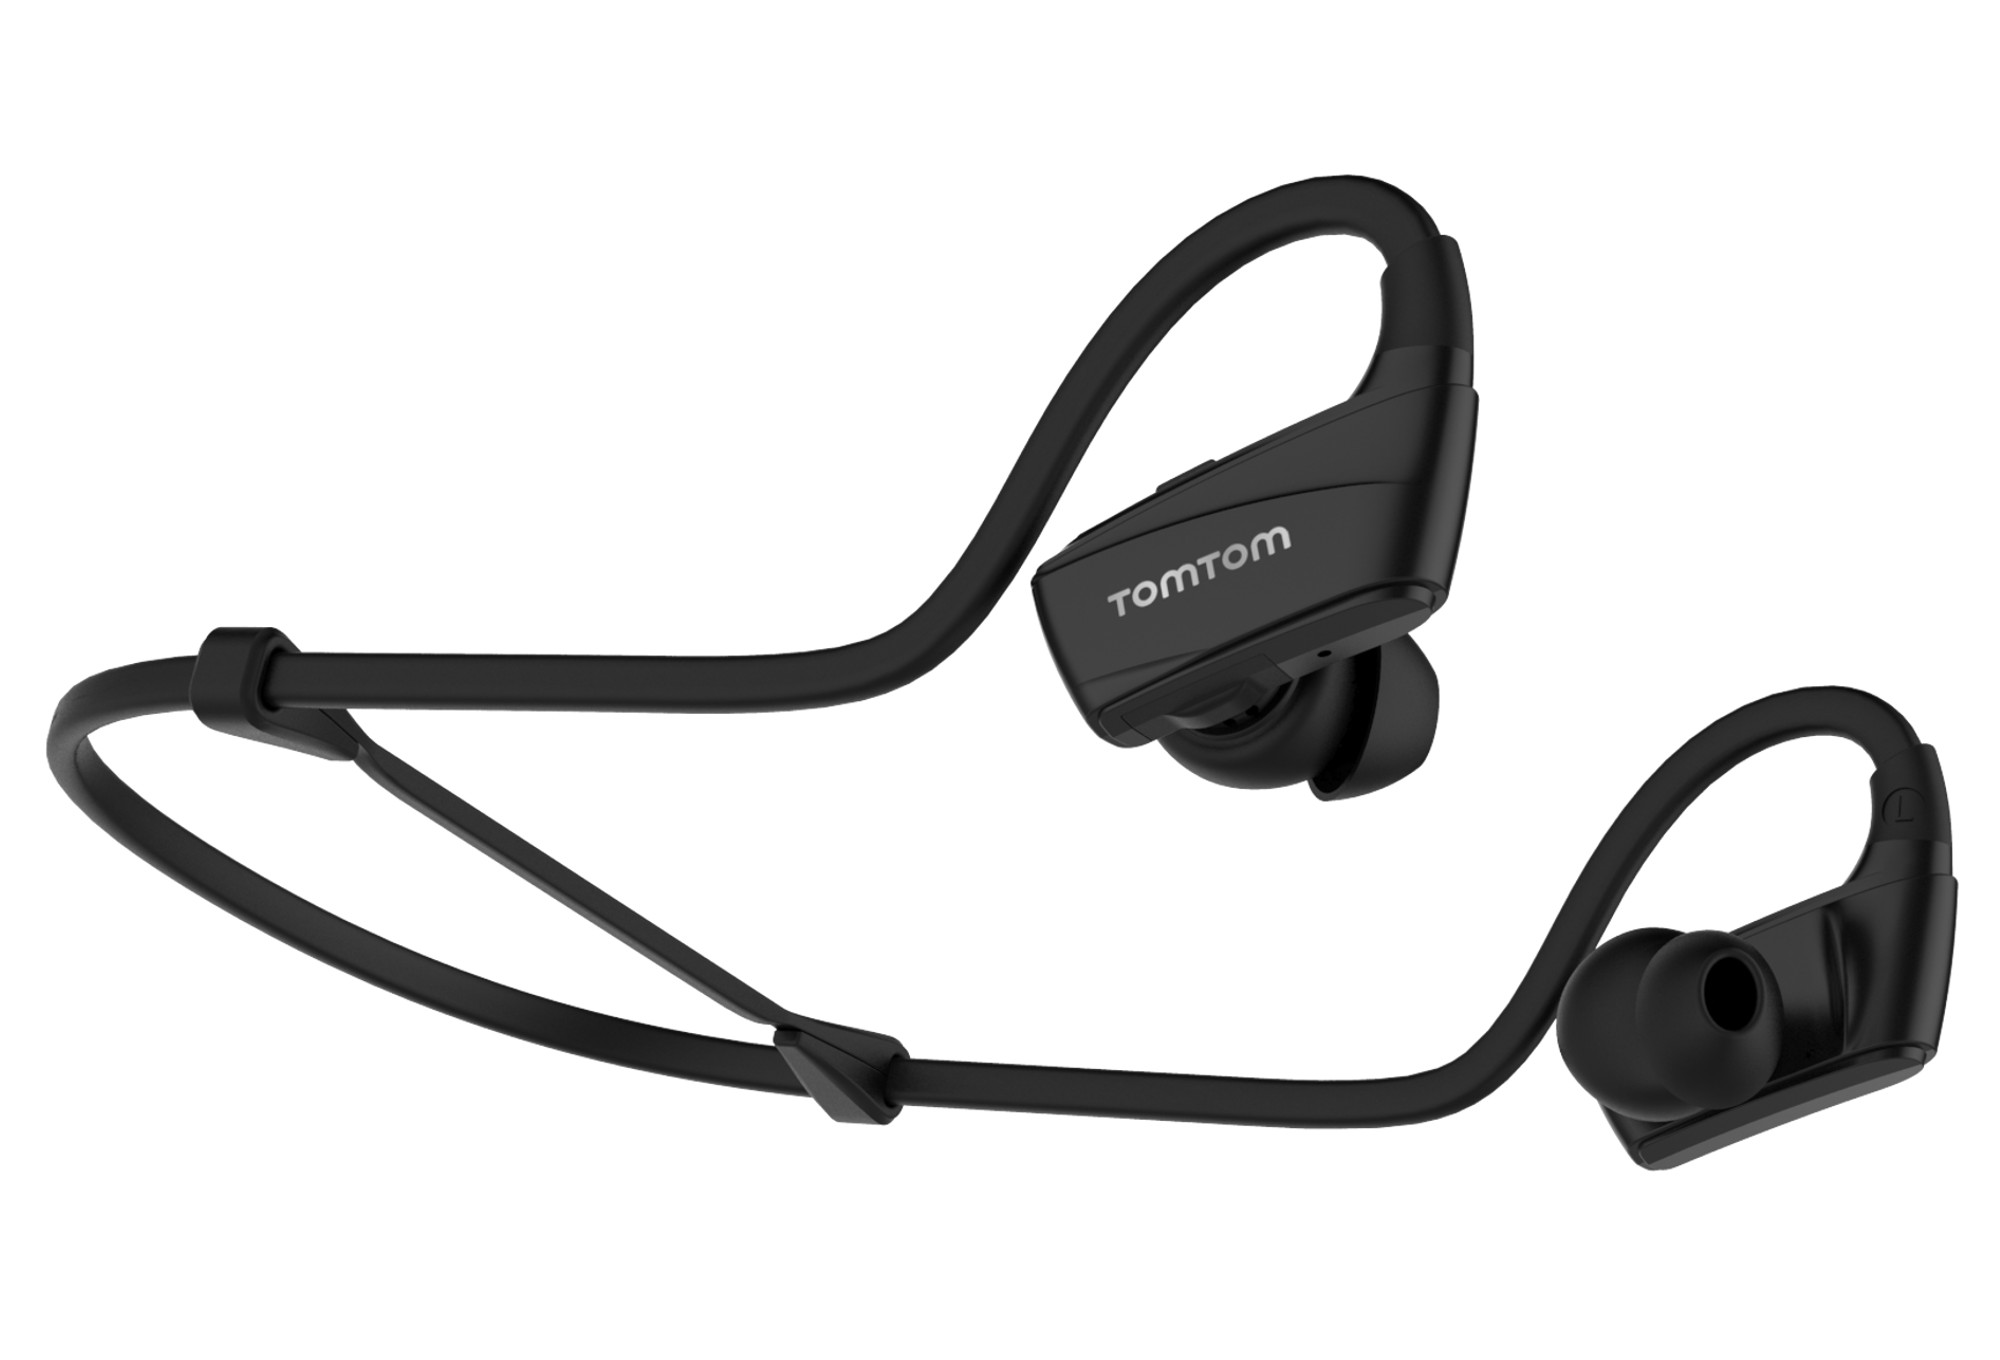 Casque sans fil Bluetooth TOMTOM SPORTS |